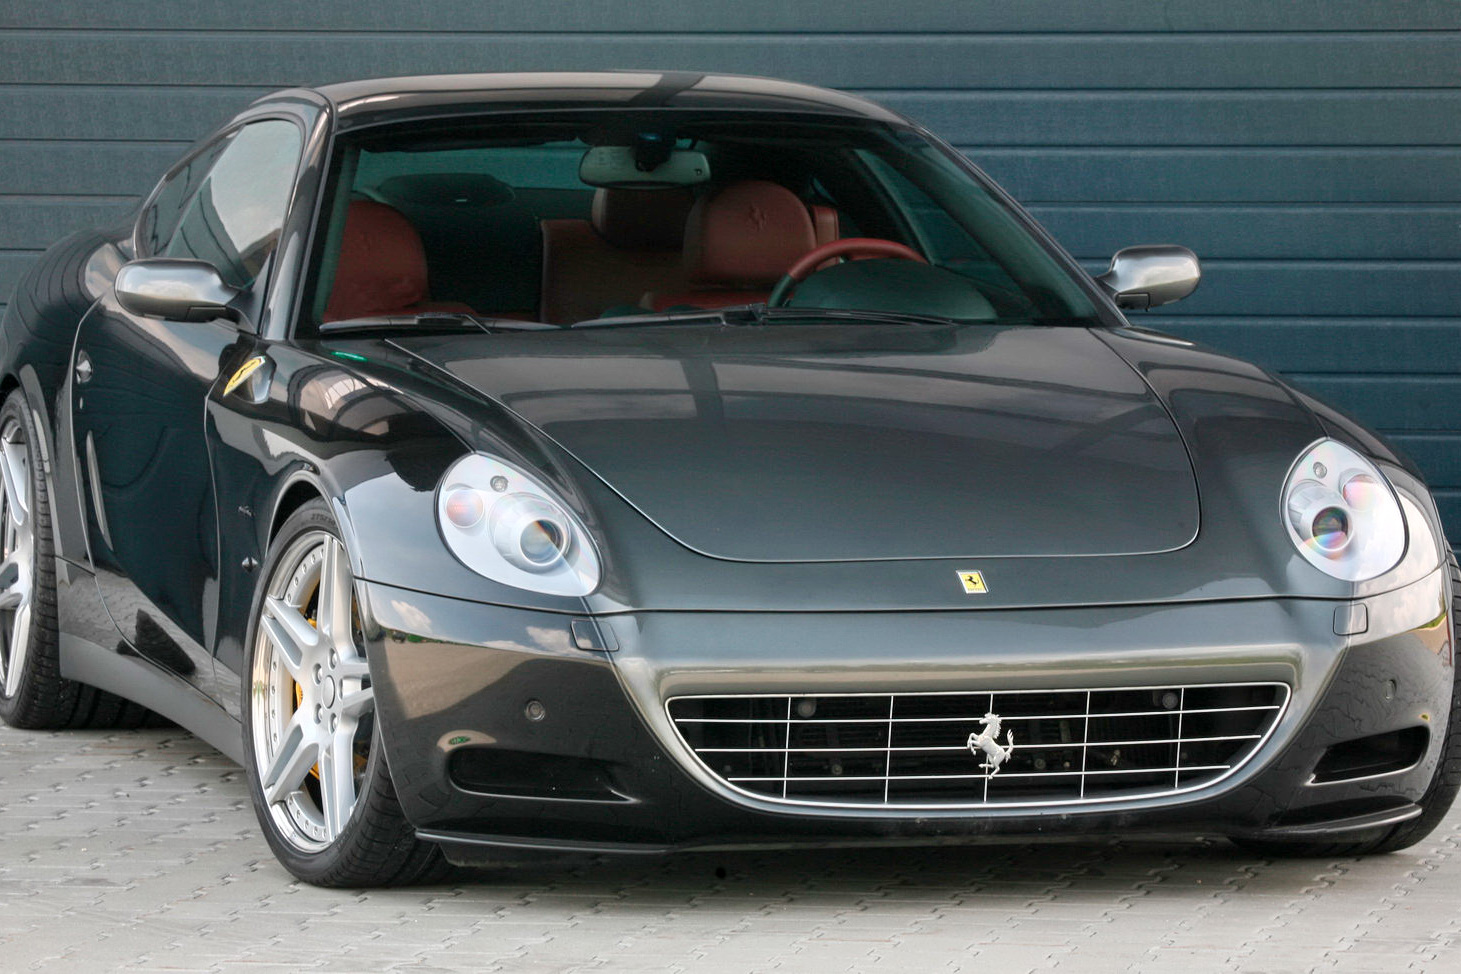 http://1.bp.blogspot.com/_FoXyvaPSnVk/S_1gmY14dXI/AAAAAAAC5DA/xrPPahmc608/s1600/Novitec-Rosso-Ferrari-612-13.JPG